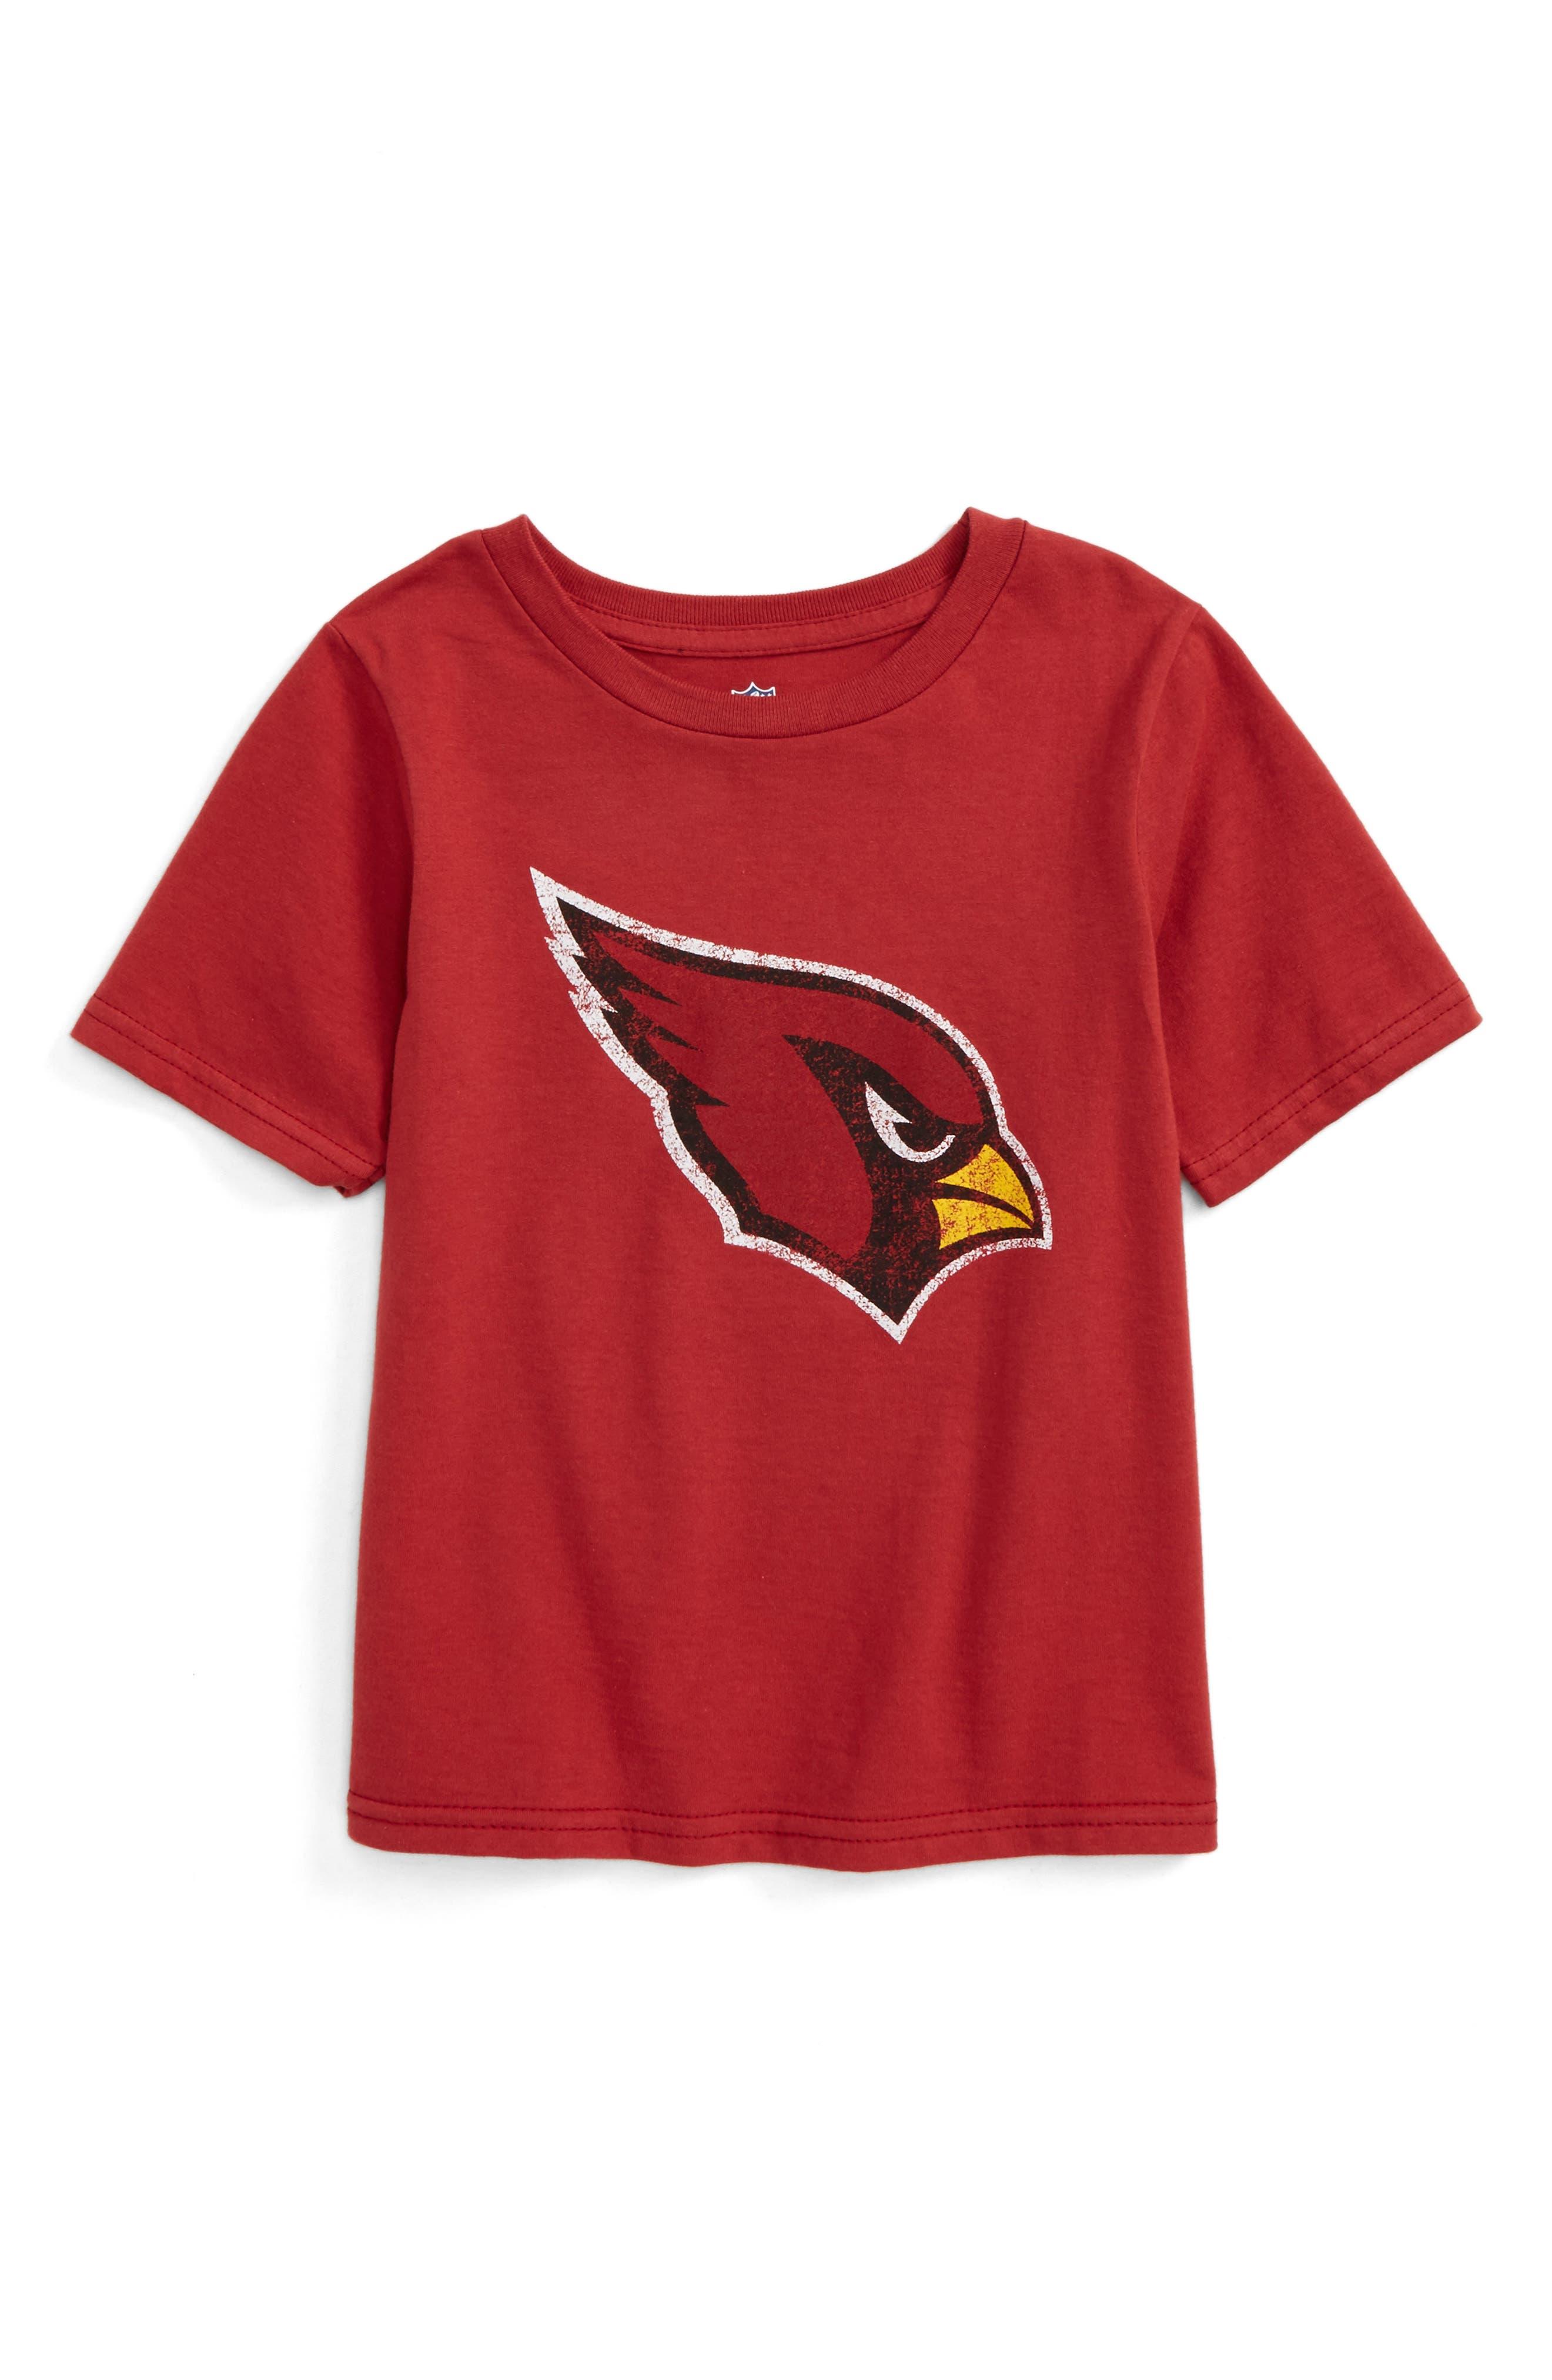 NFL - Arizona Cardinals Distressed Logo T-Shirt,                             Main thumbnail 1, color,                             600